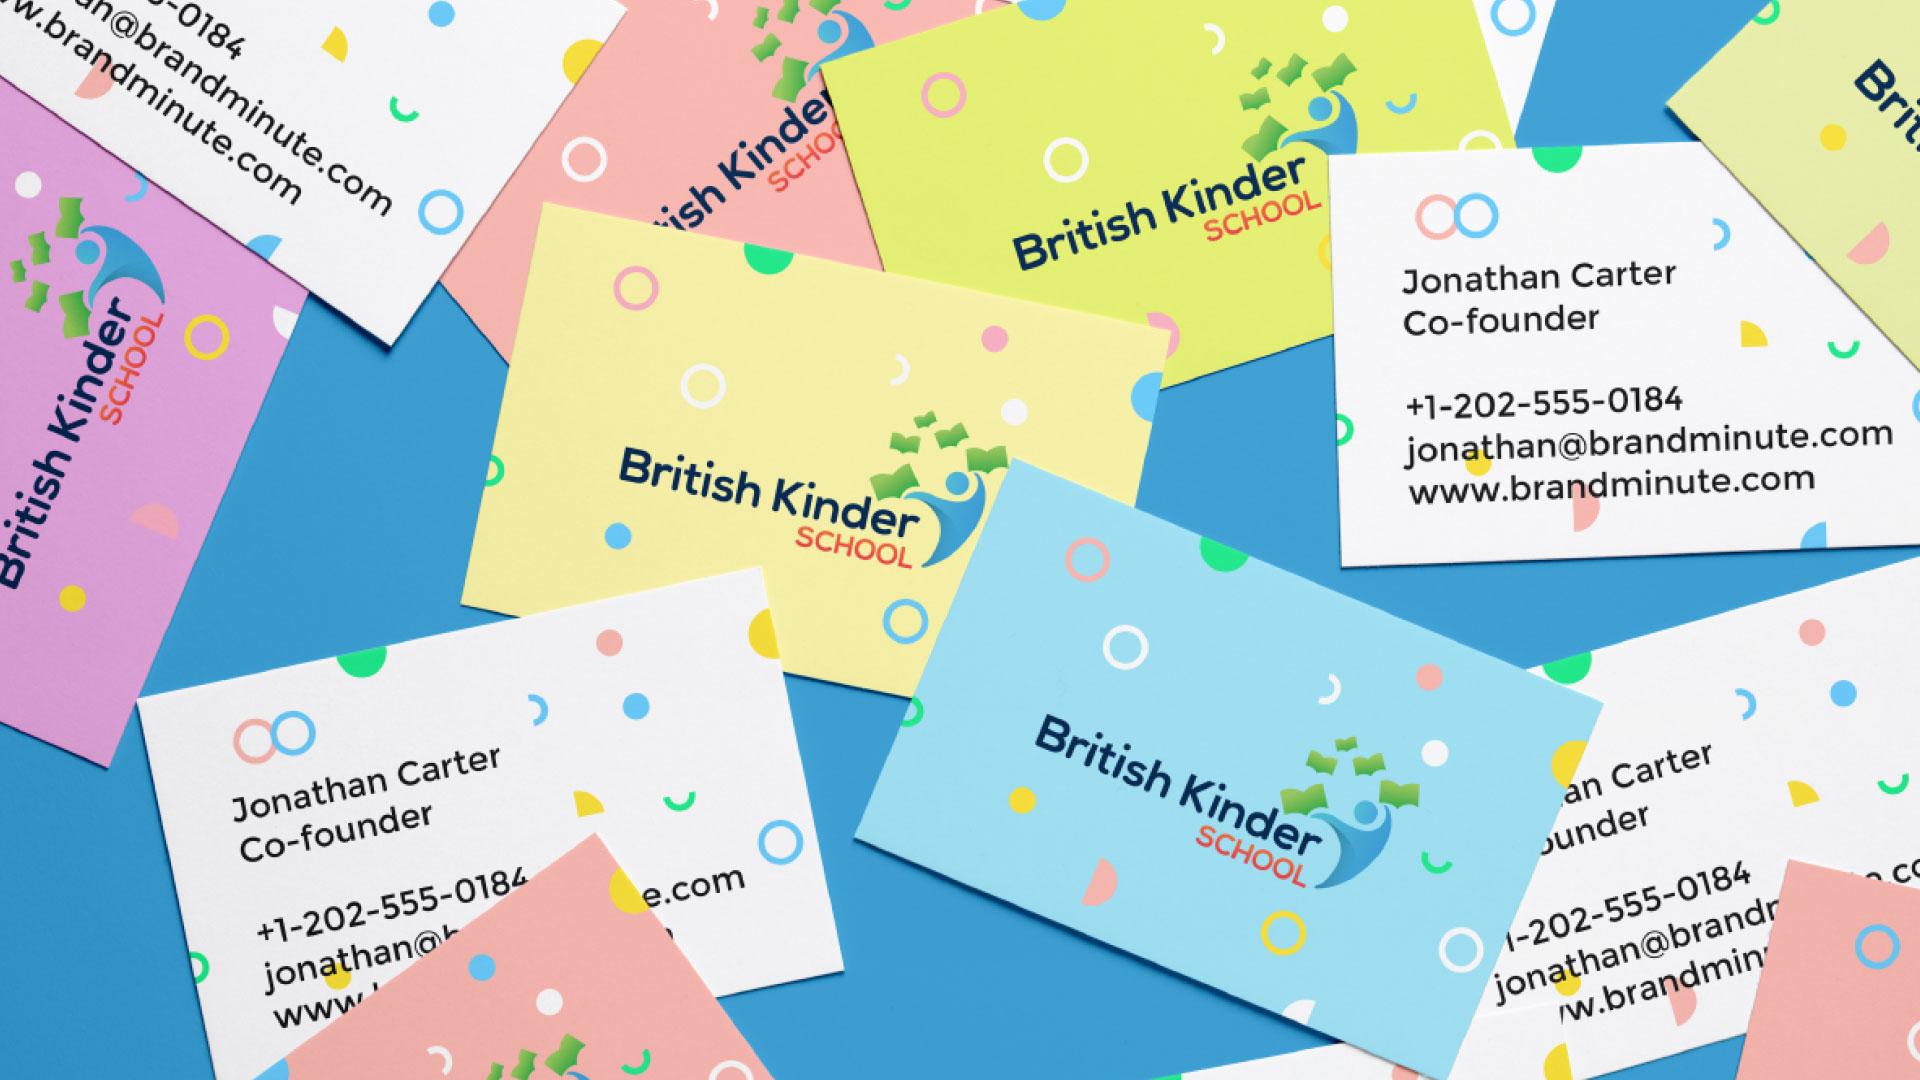 British Kinder School Branding Design